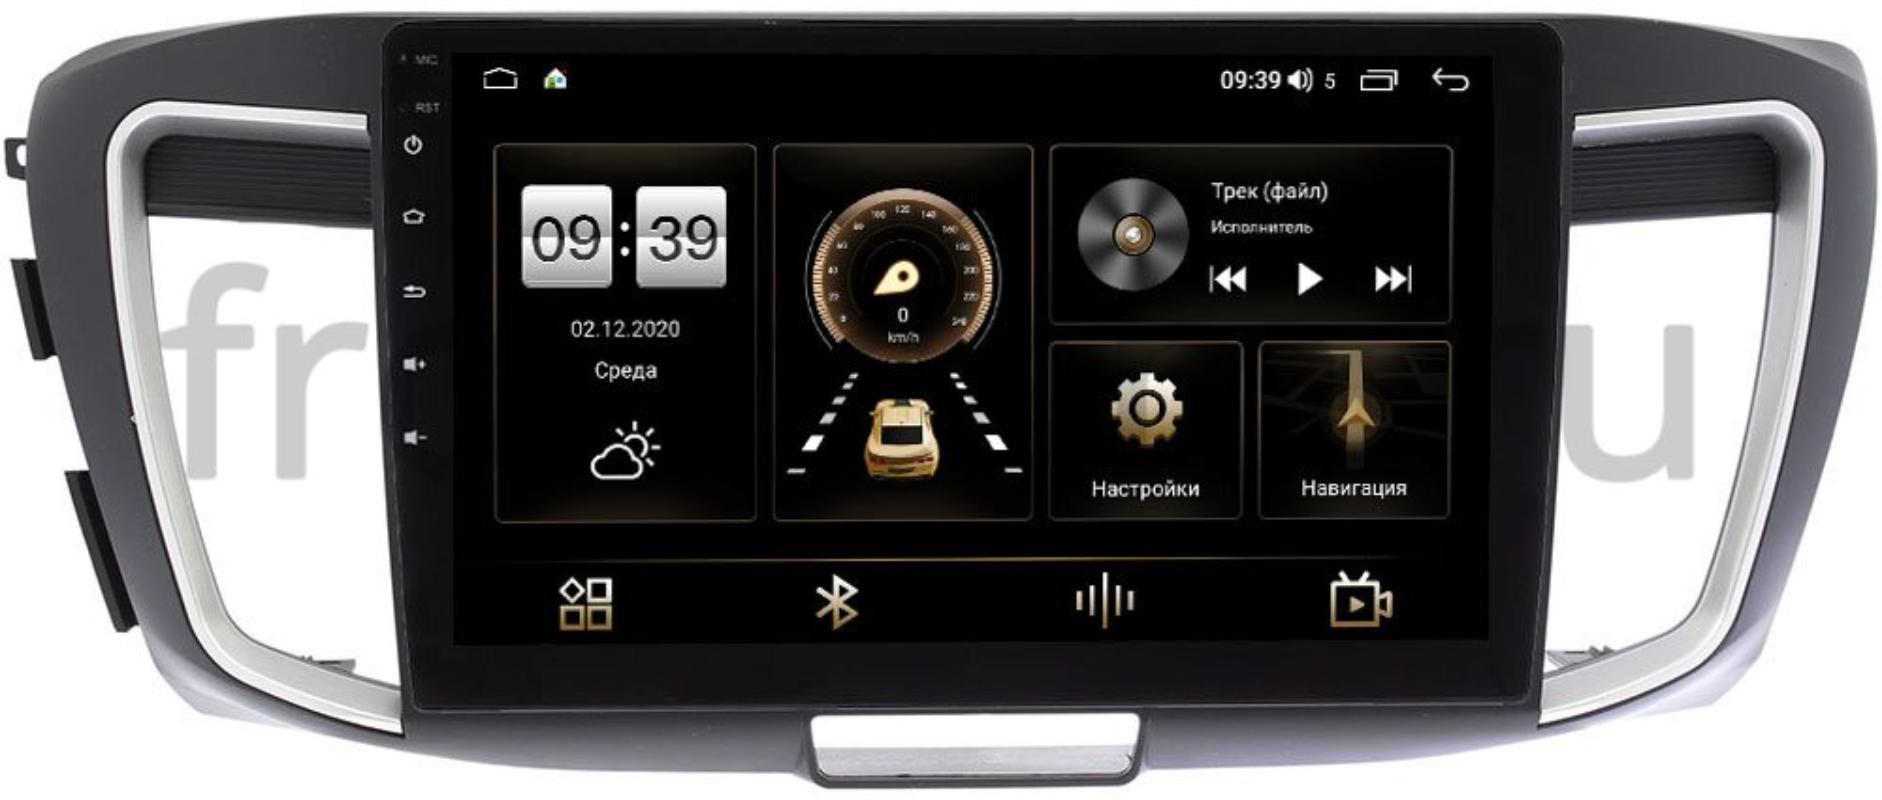 Штатная магнитола Honda Accord 9 (IX) 2013-2015 LeTrun 4165-10-1156 на Android 10 (4G-SIM, 3/32, DSP, QLed) (+ Камера заднего вида в подарок!)